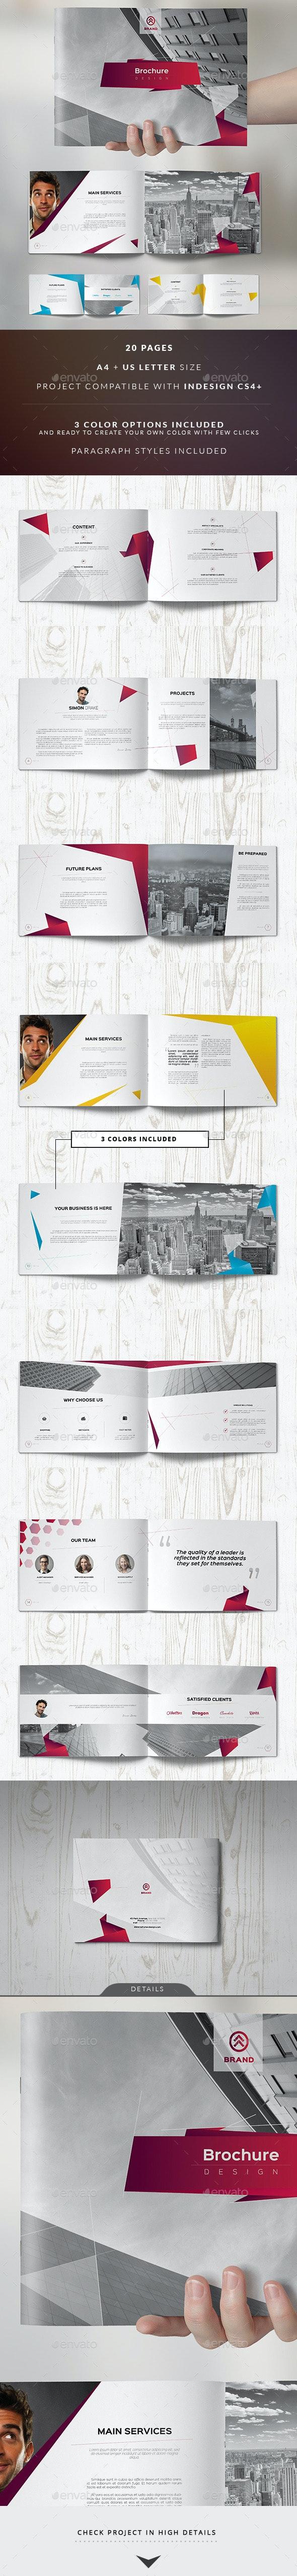 Multipurpose Business Catalog / Brochure 2 - Corporate Brochures